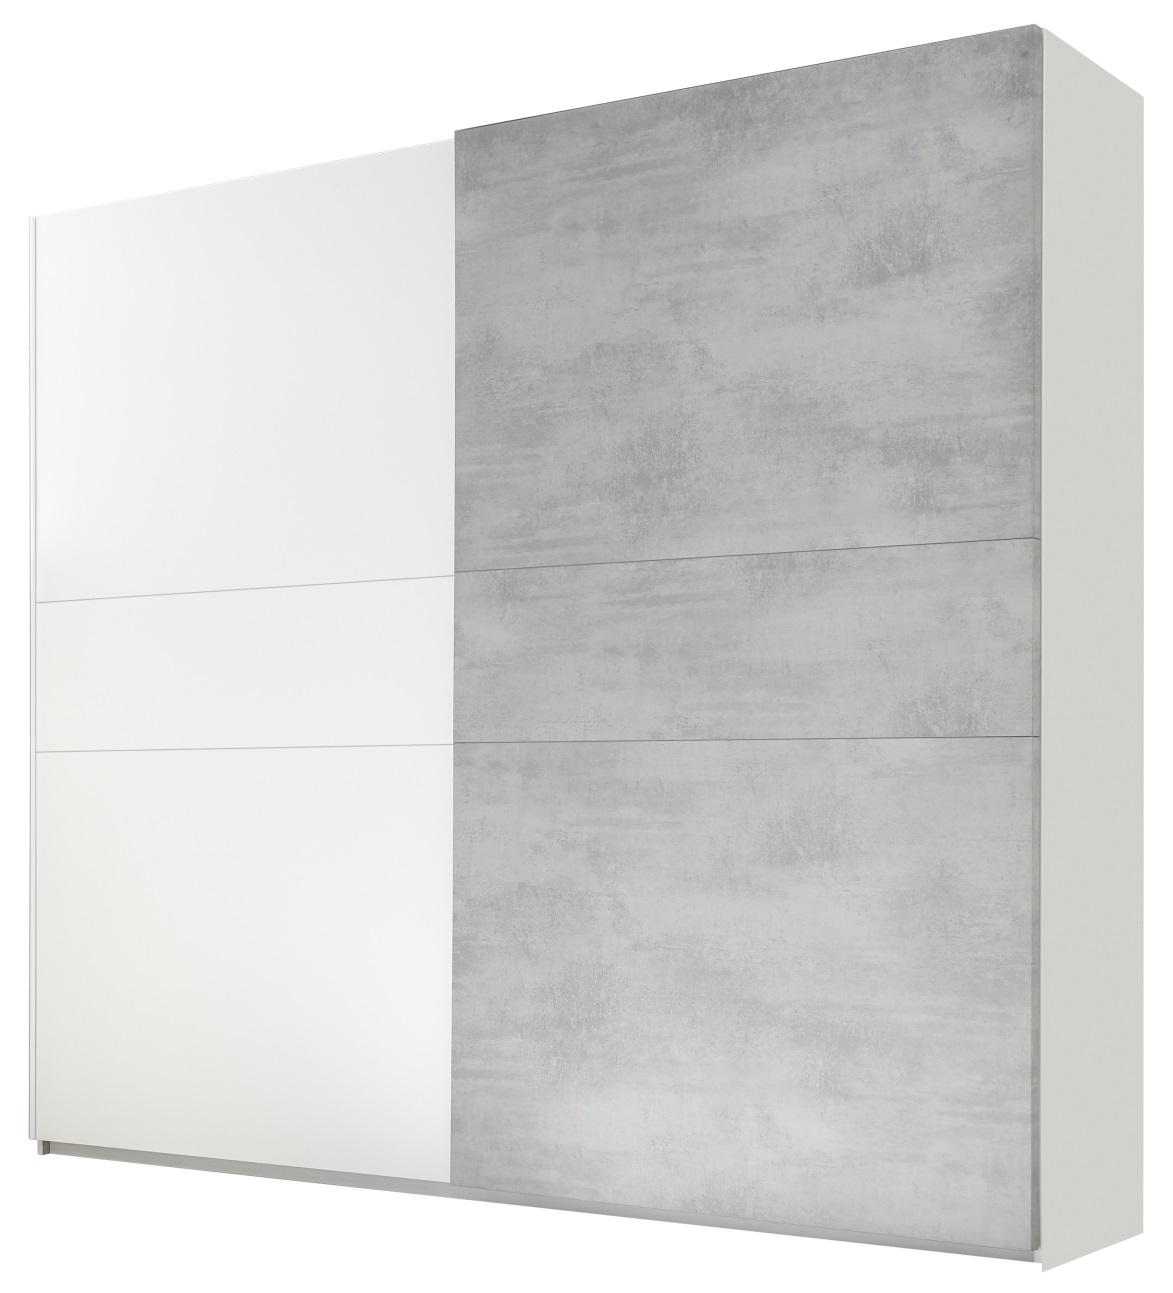 slaapkamerkast zweefdeurkast Amalti 275 cm breed in mat wit met grijs beton